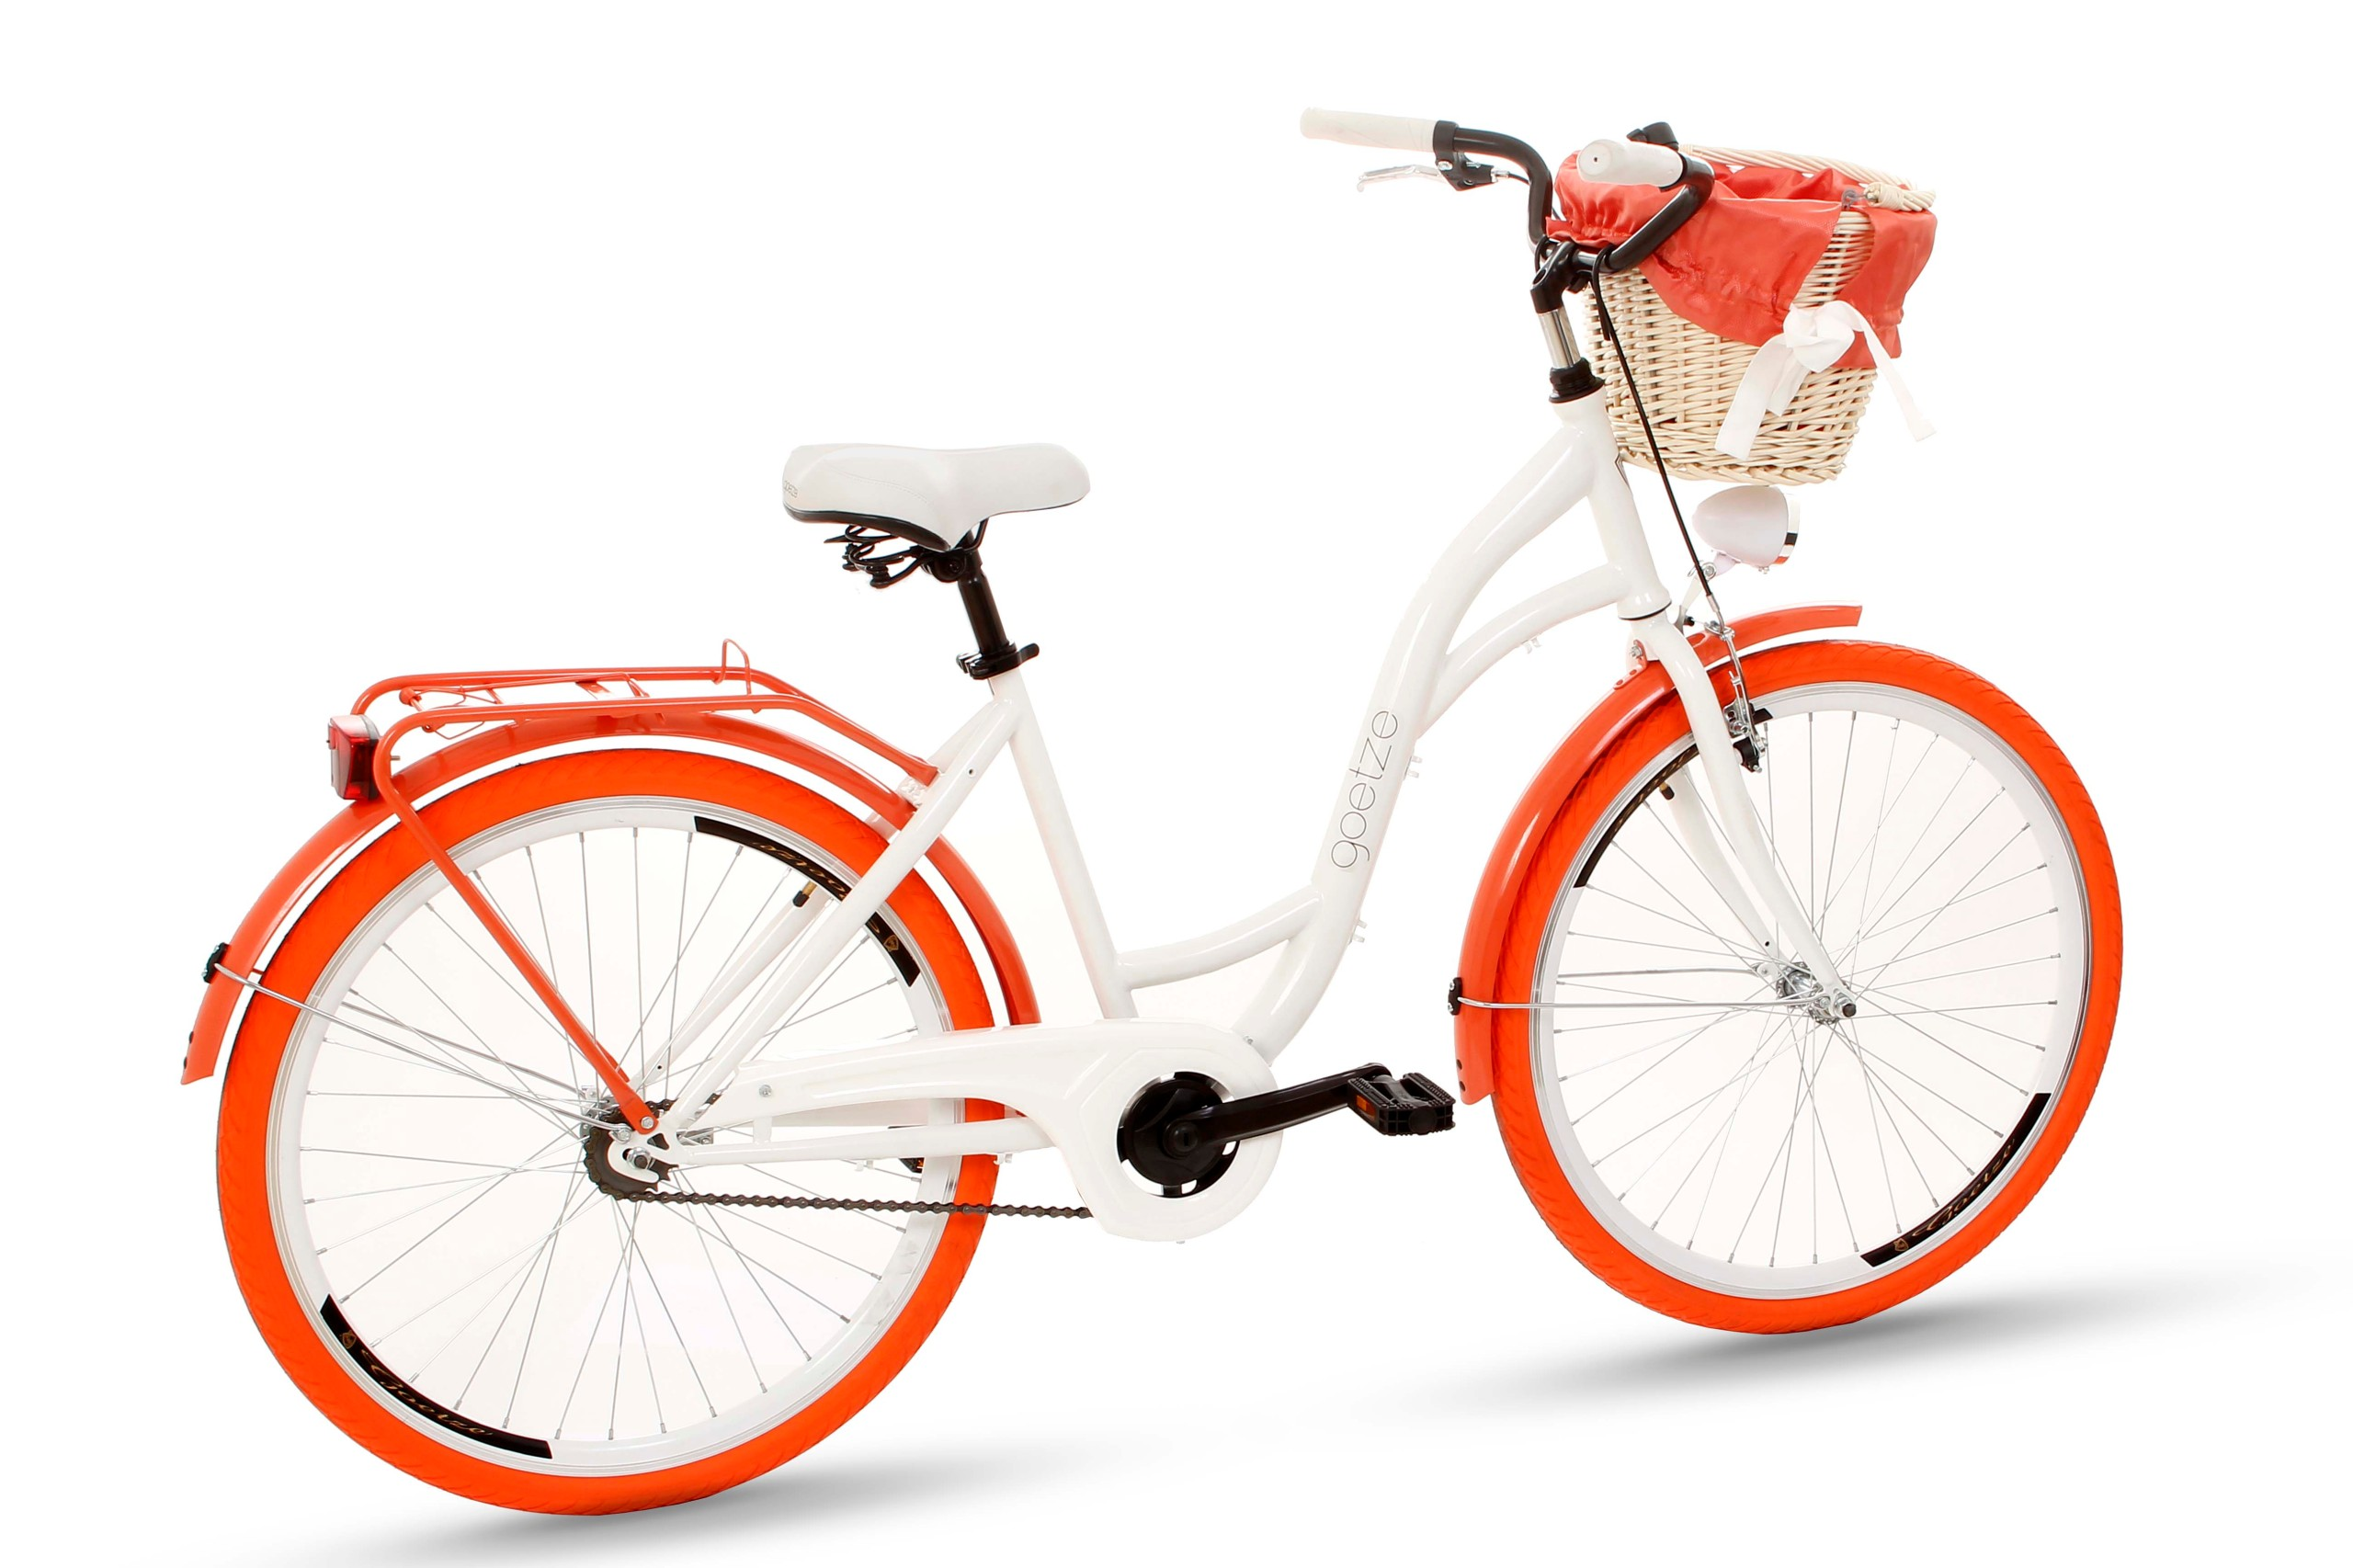 Dámsky mestský bicykel Goetze COLORS 26 košík!  Dodatočná kompletácia, stojan, blatníky, kôš, osvetlenie, noha, kryt reťaze